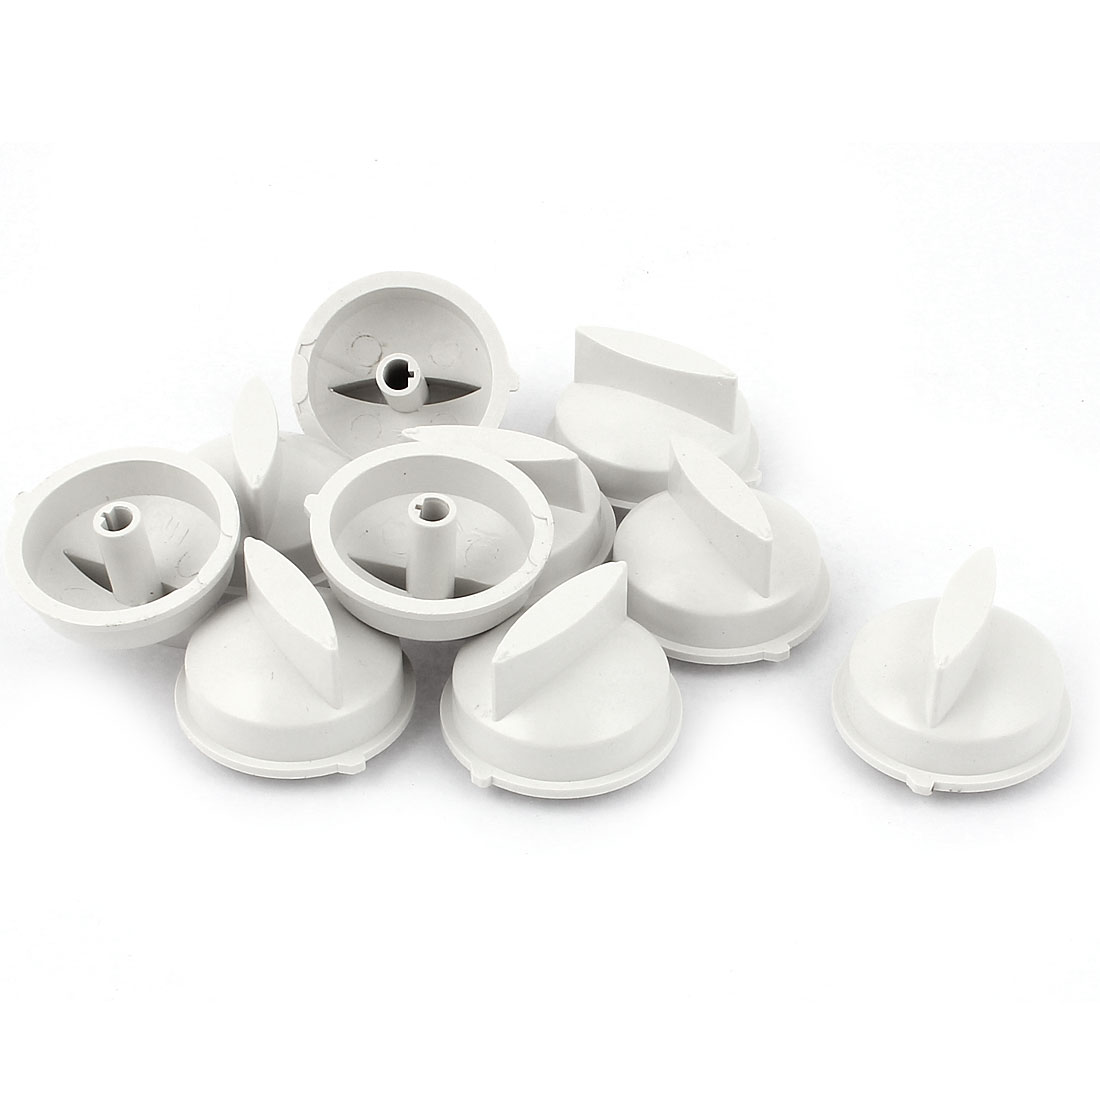 10pcs 6mm Inner Diameter Washer Dryer Washing Machine Turning Timer Knob White